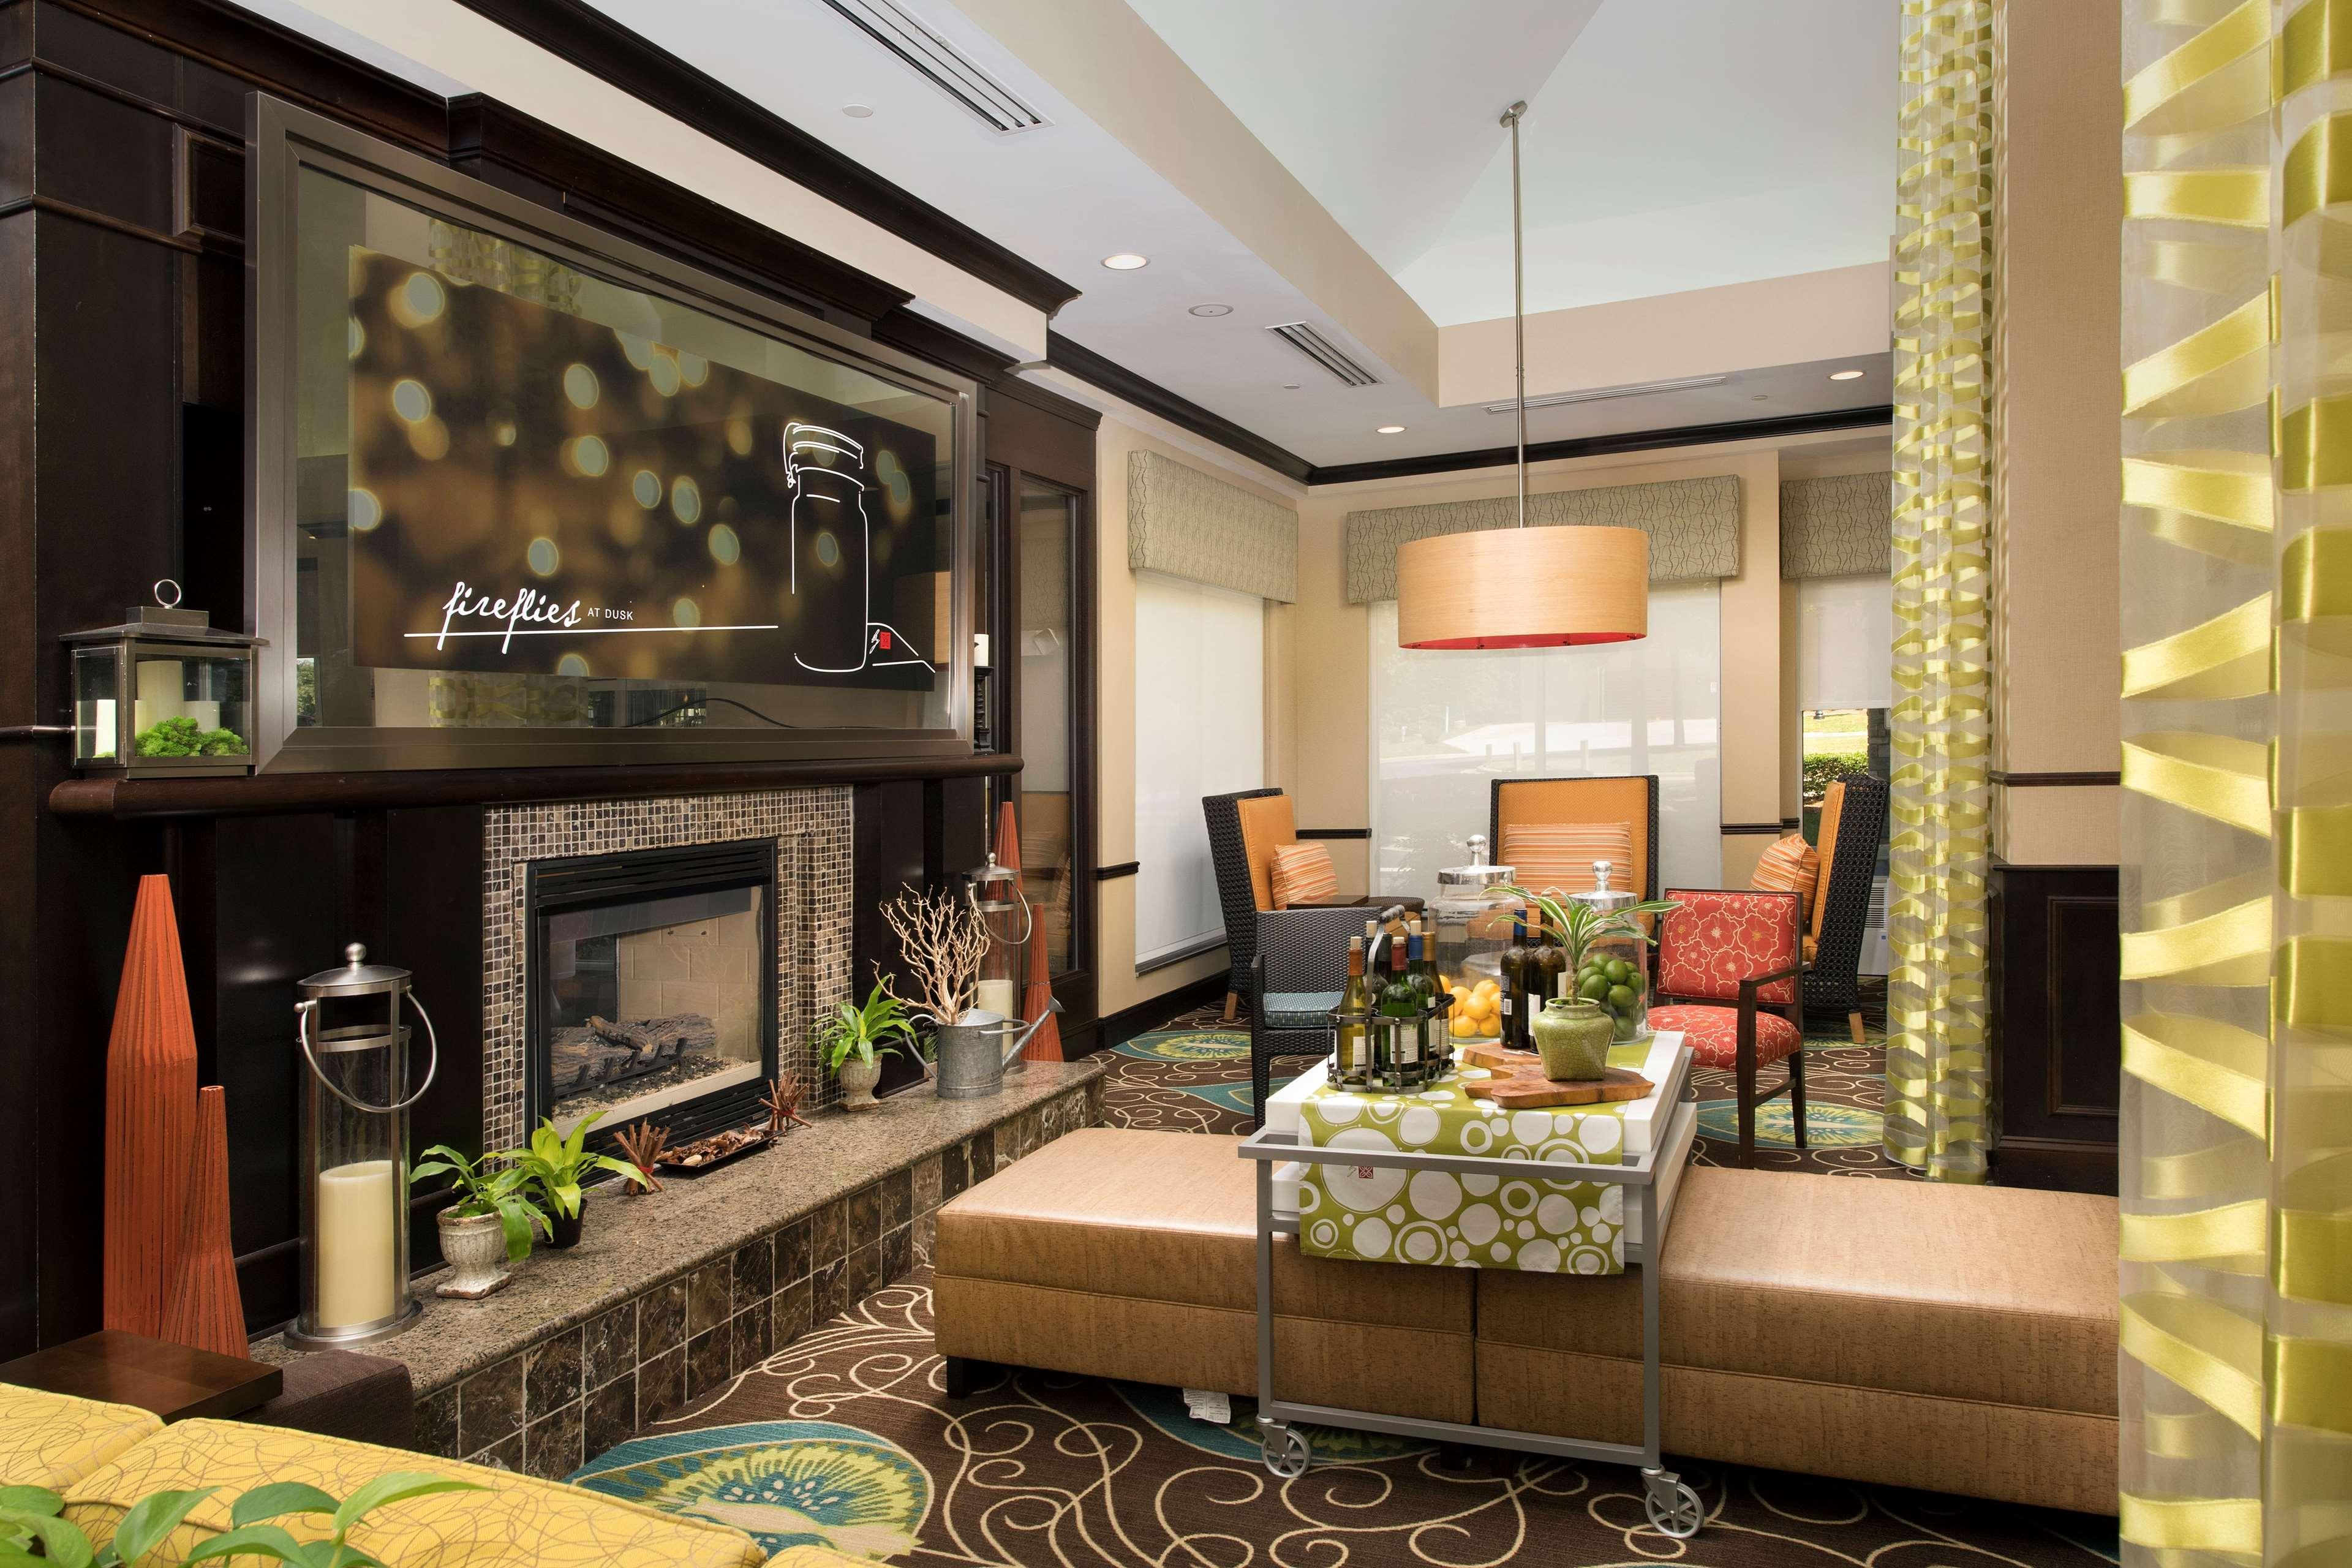 Hilton Garden Inn Winston-Salem/Hanes Mall image 3